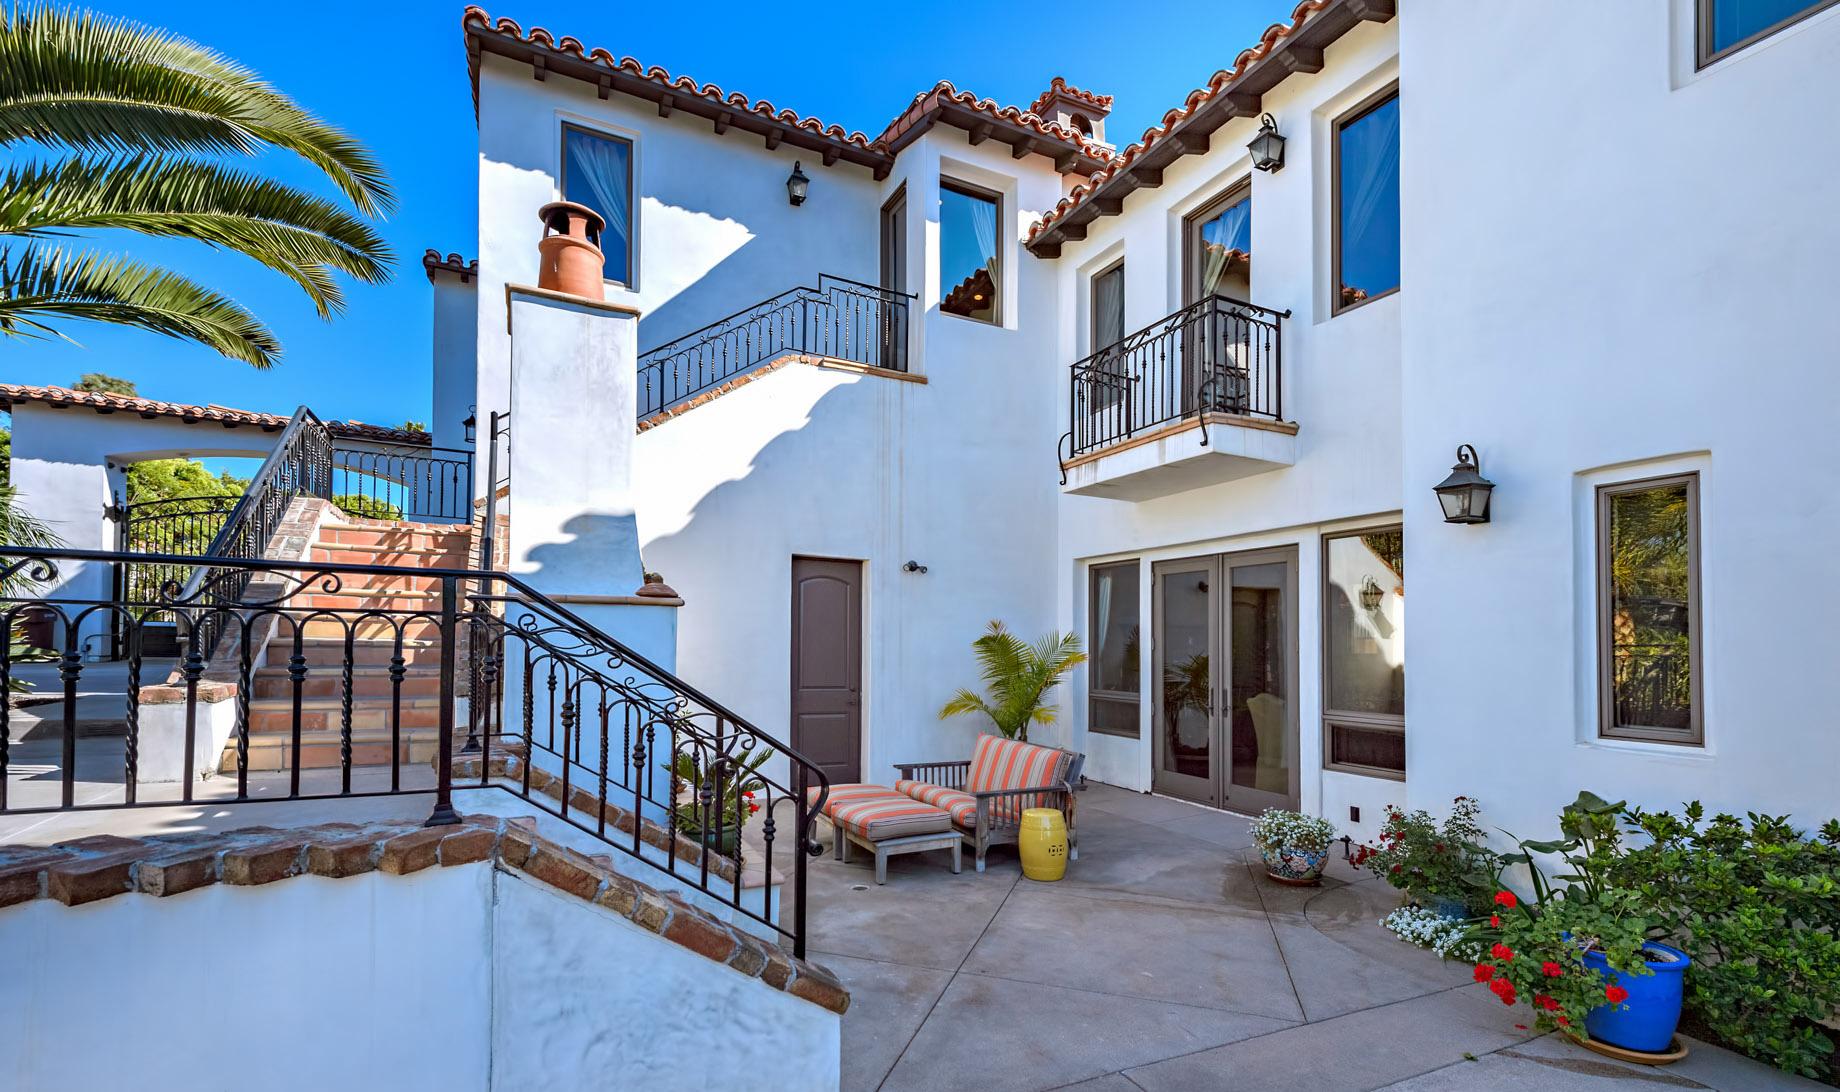 La Cuesta Estate – 202 Avenida La Cuesta, San Clemente, CA, USA